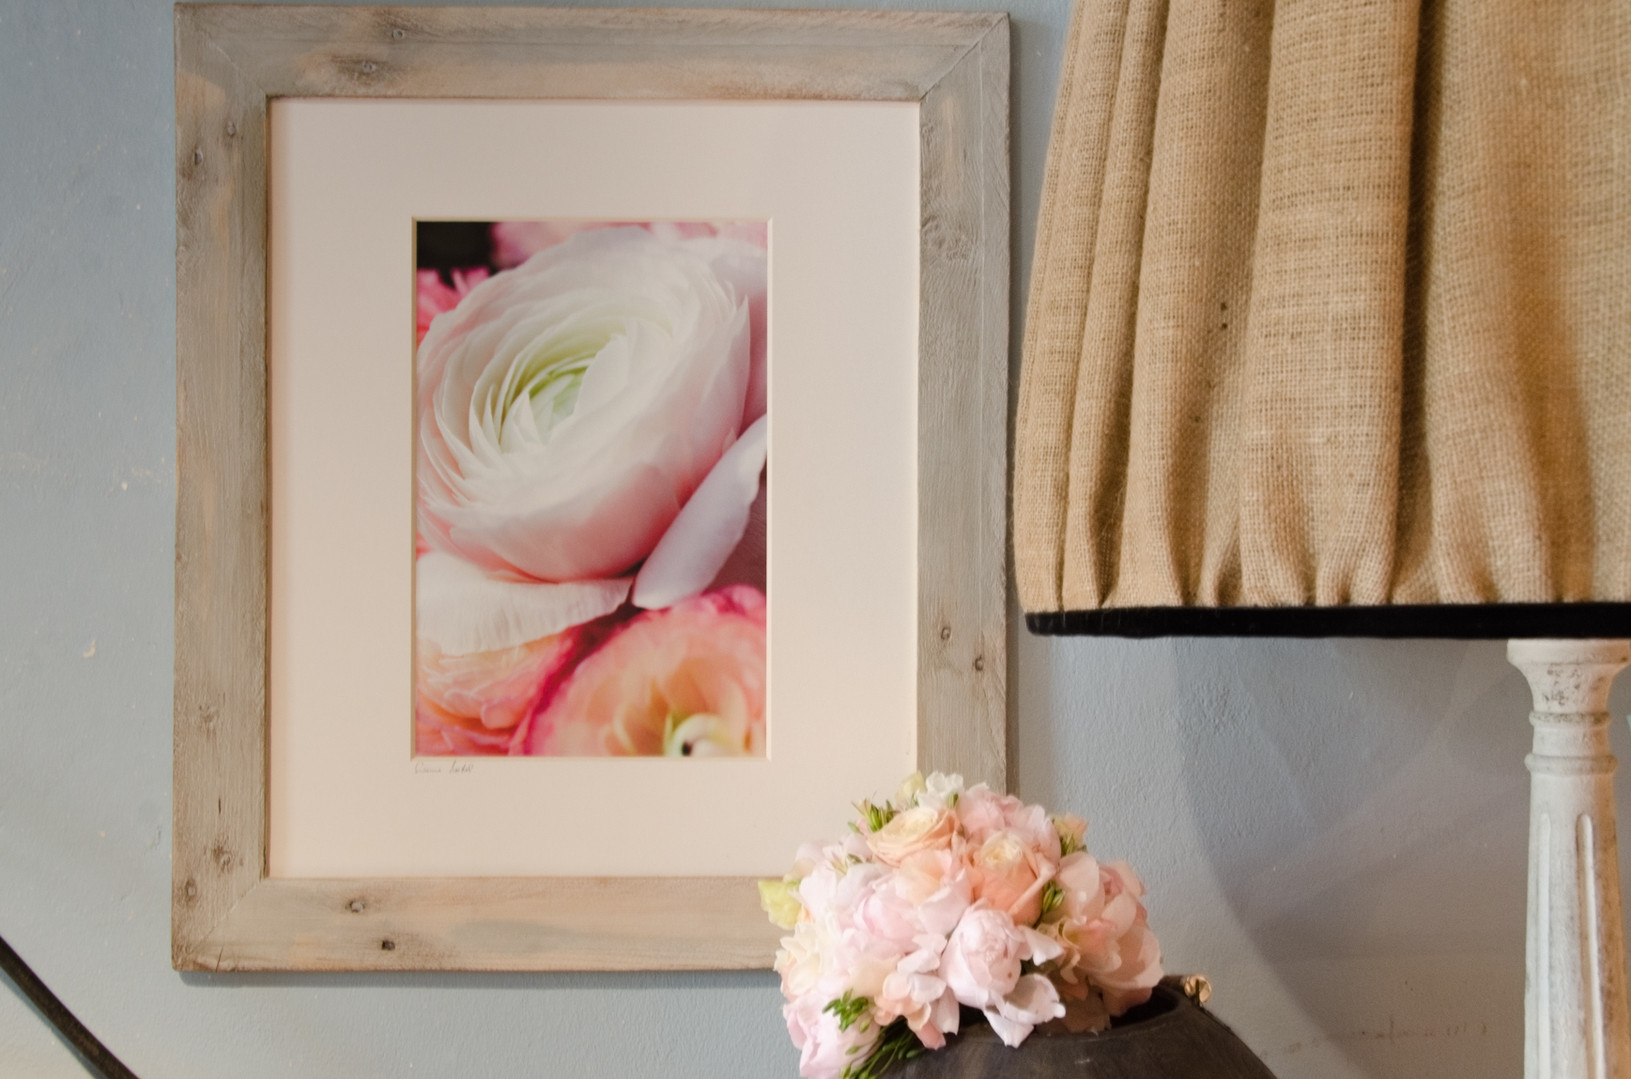 09 Floral mood - Susanne Paetsch photo